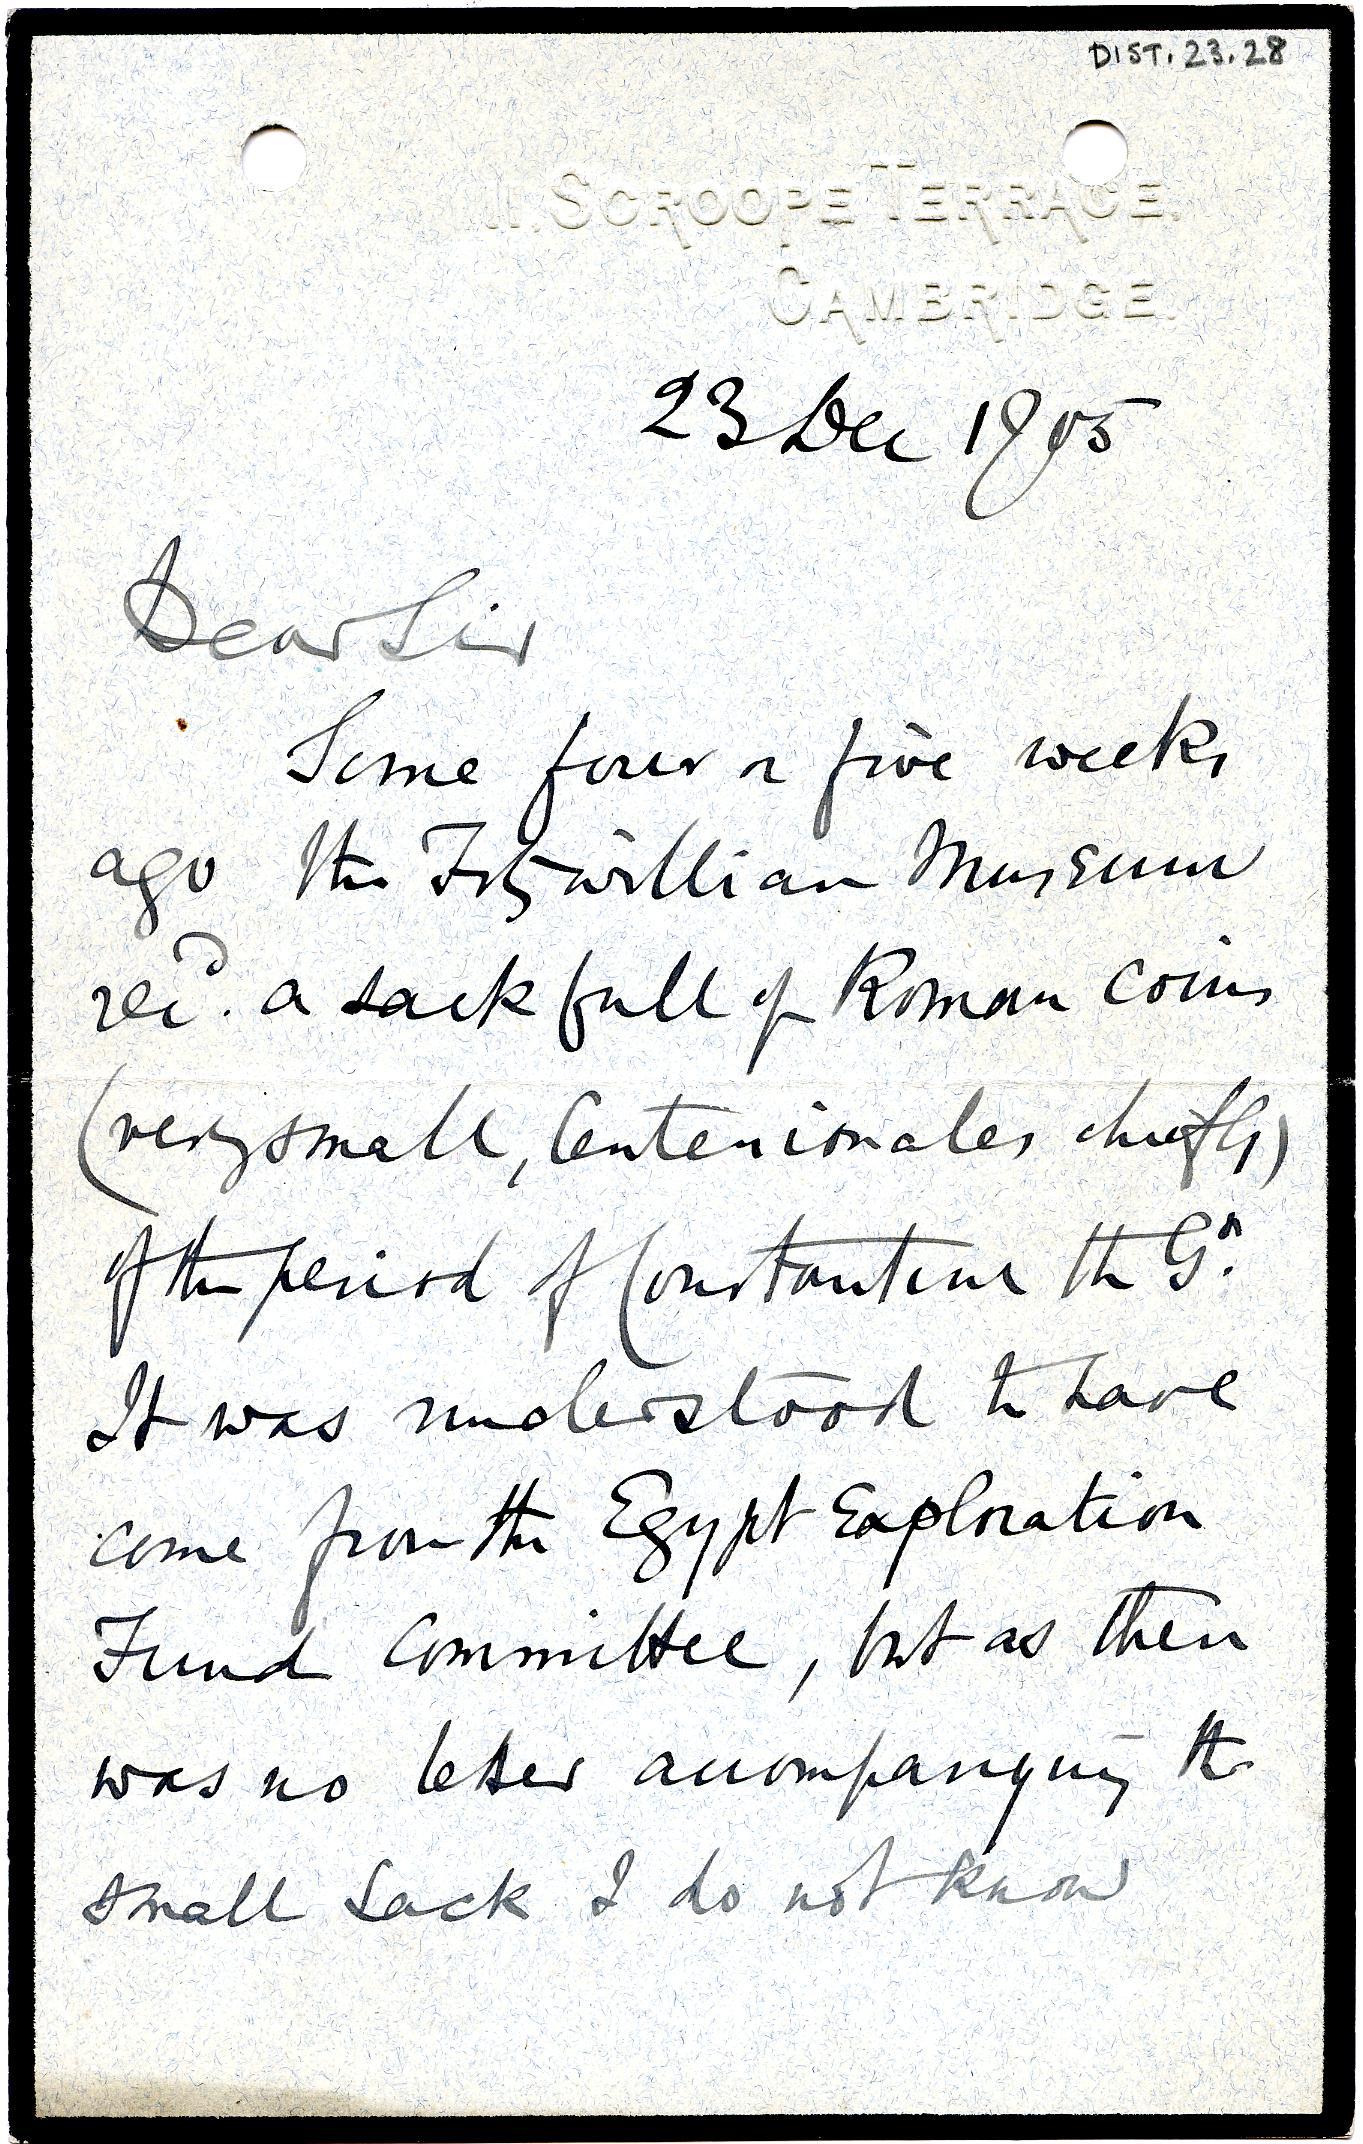 1904-05 Sinai, Deir el-Bahri, Oxyrhynchus, Naukratis DIST.23.28